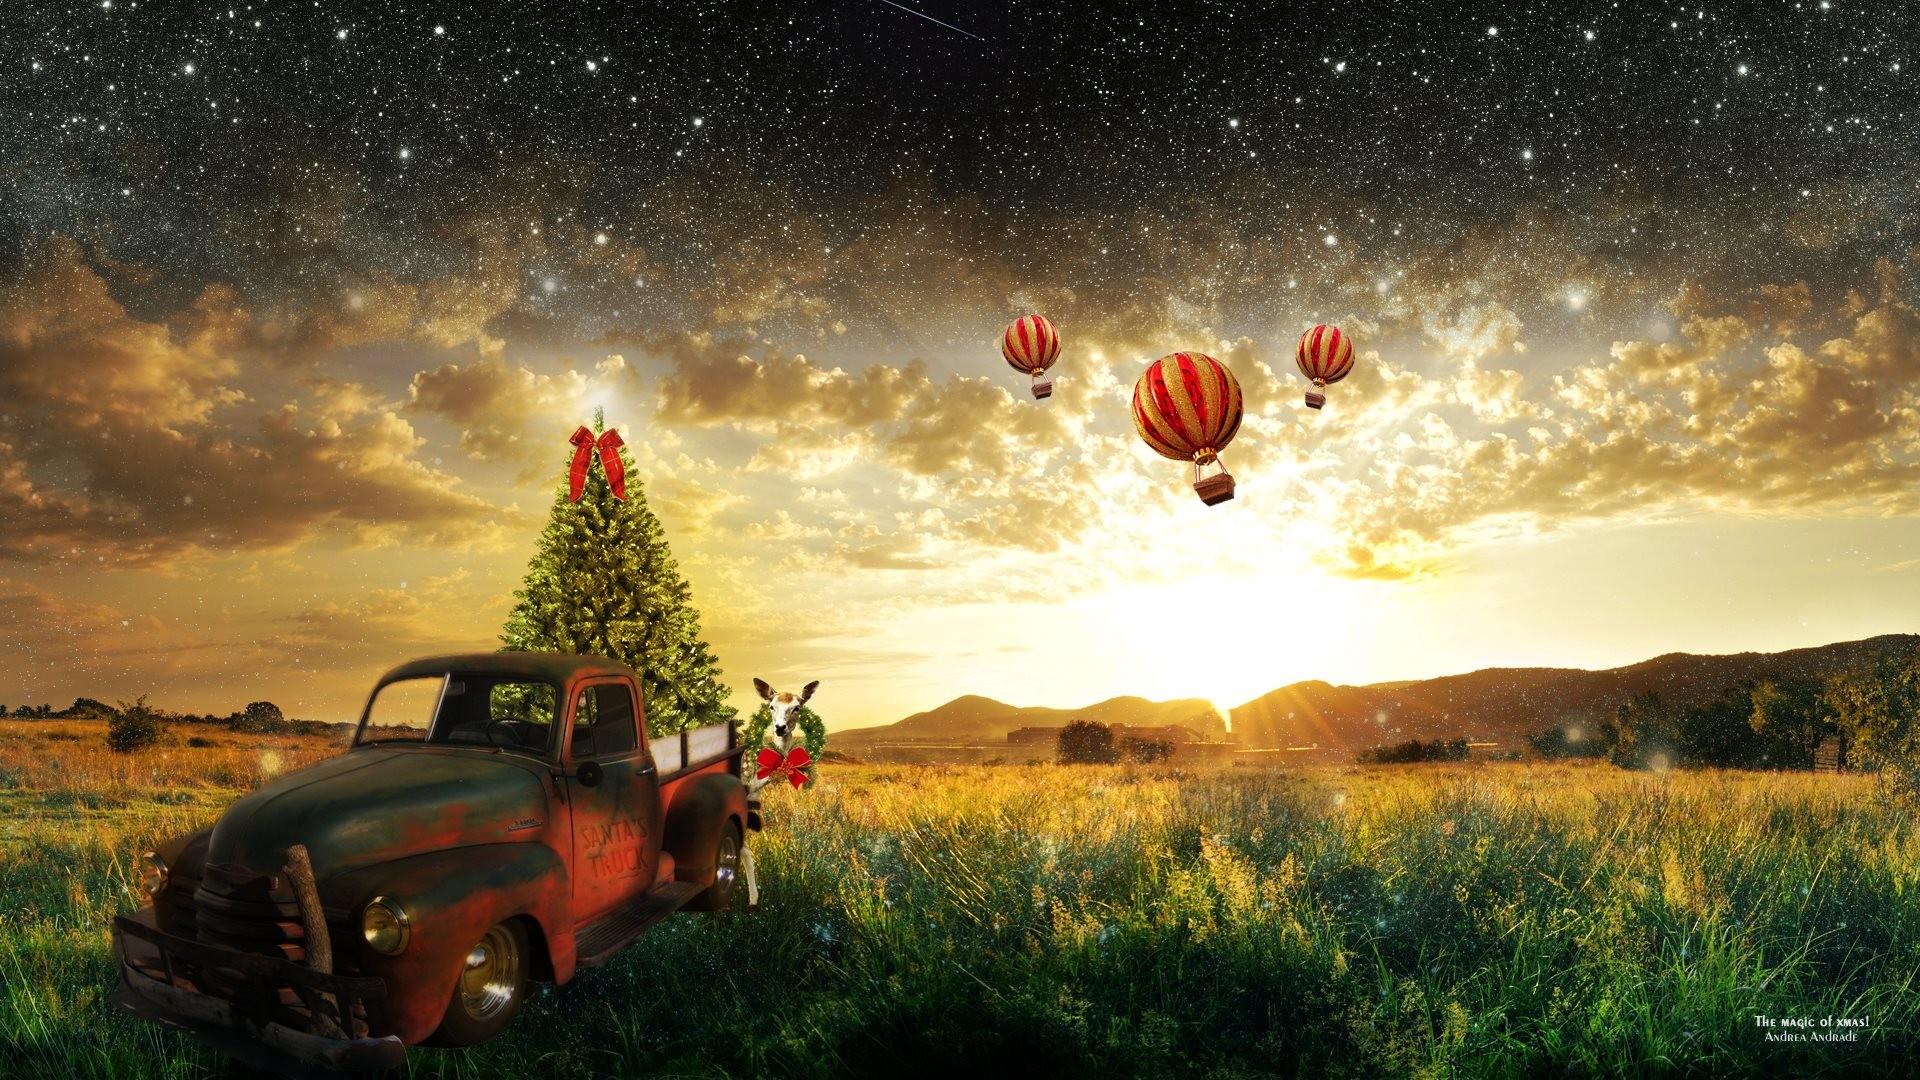 HD Wallpaper: The magic of Christmas